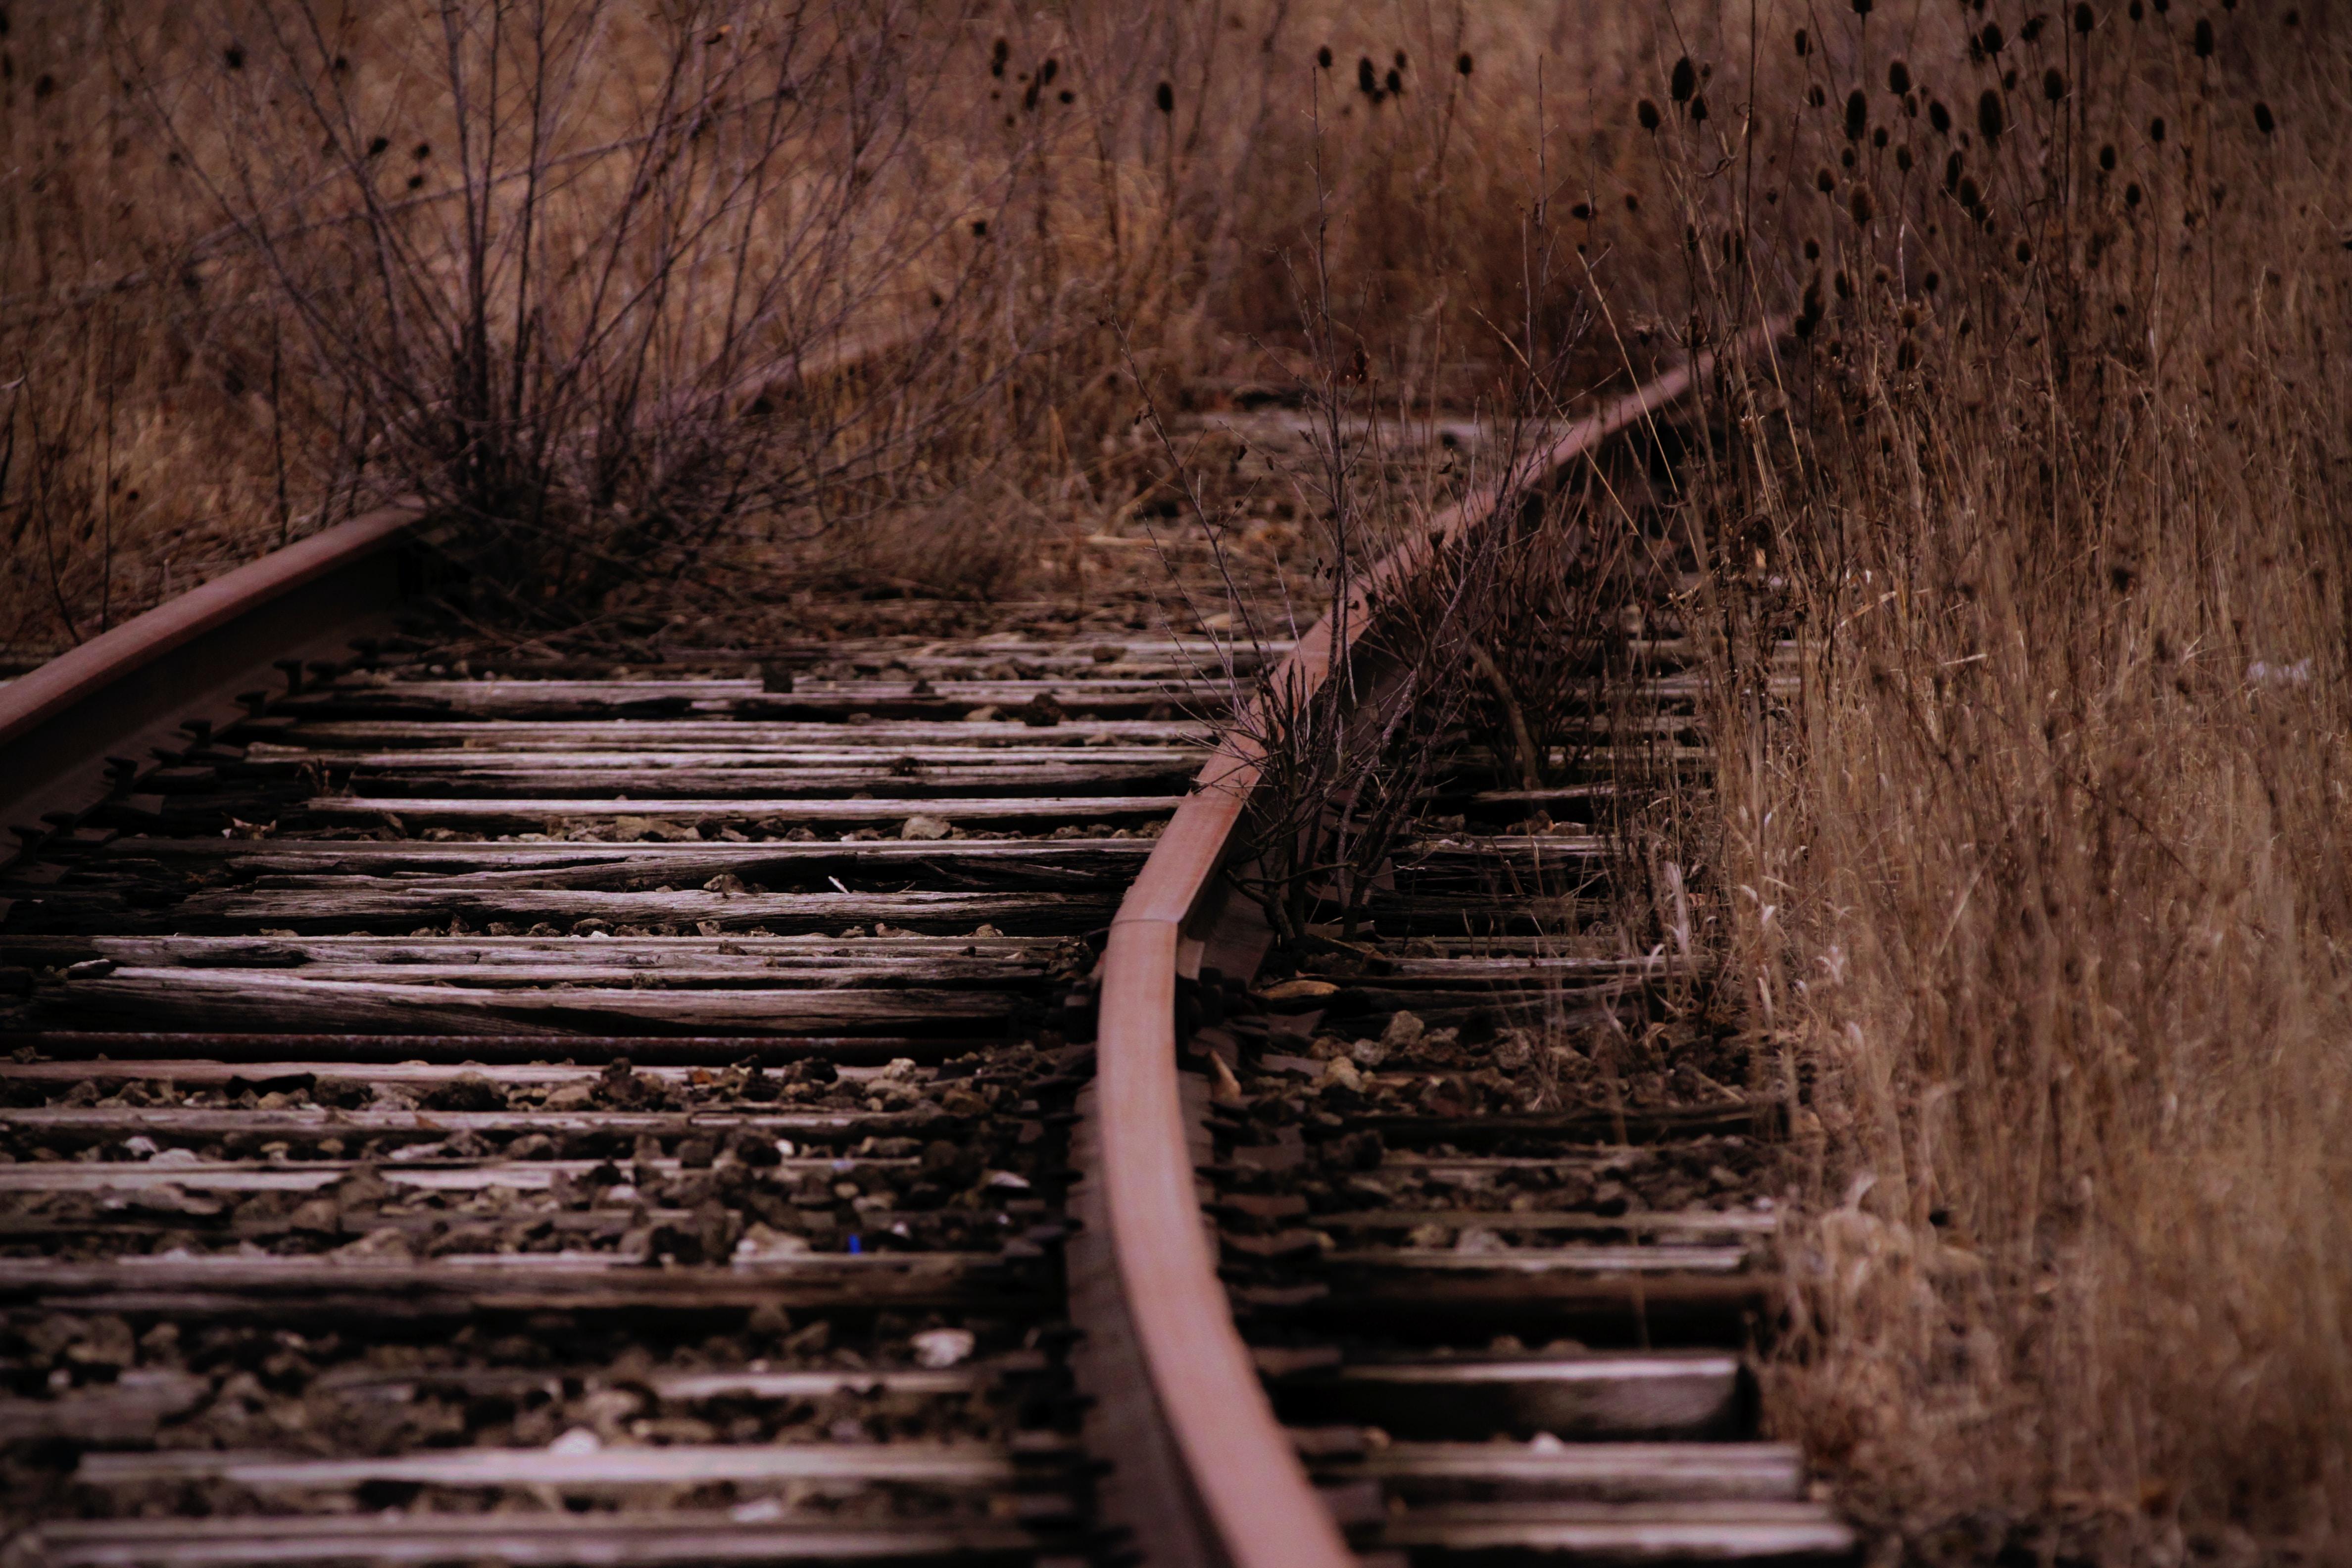 railroad surround with grass